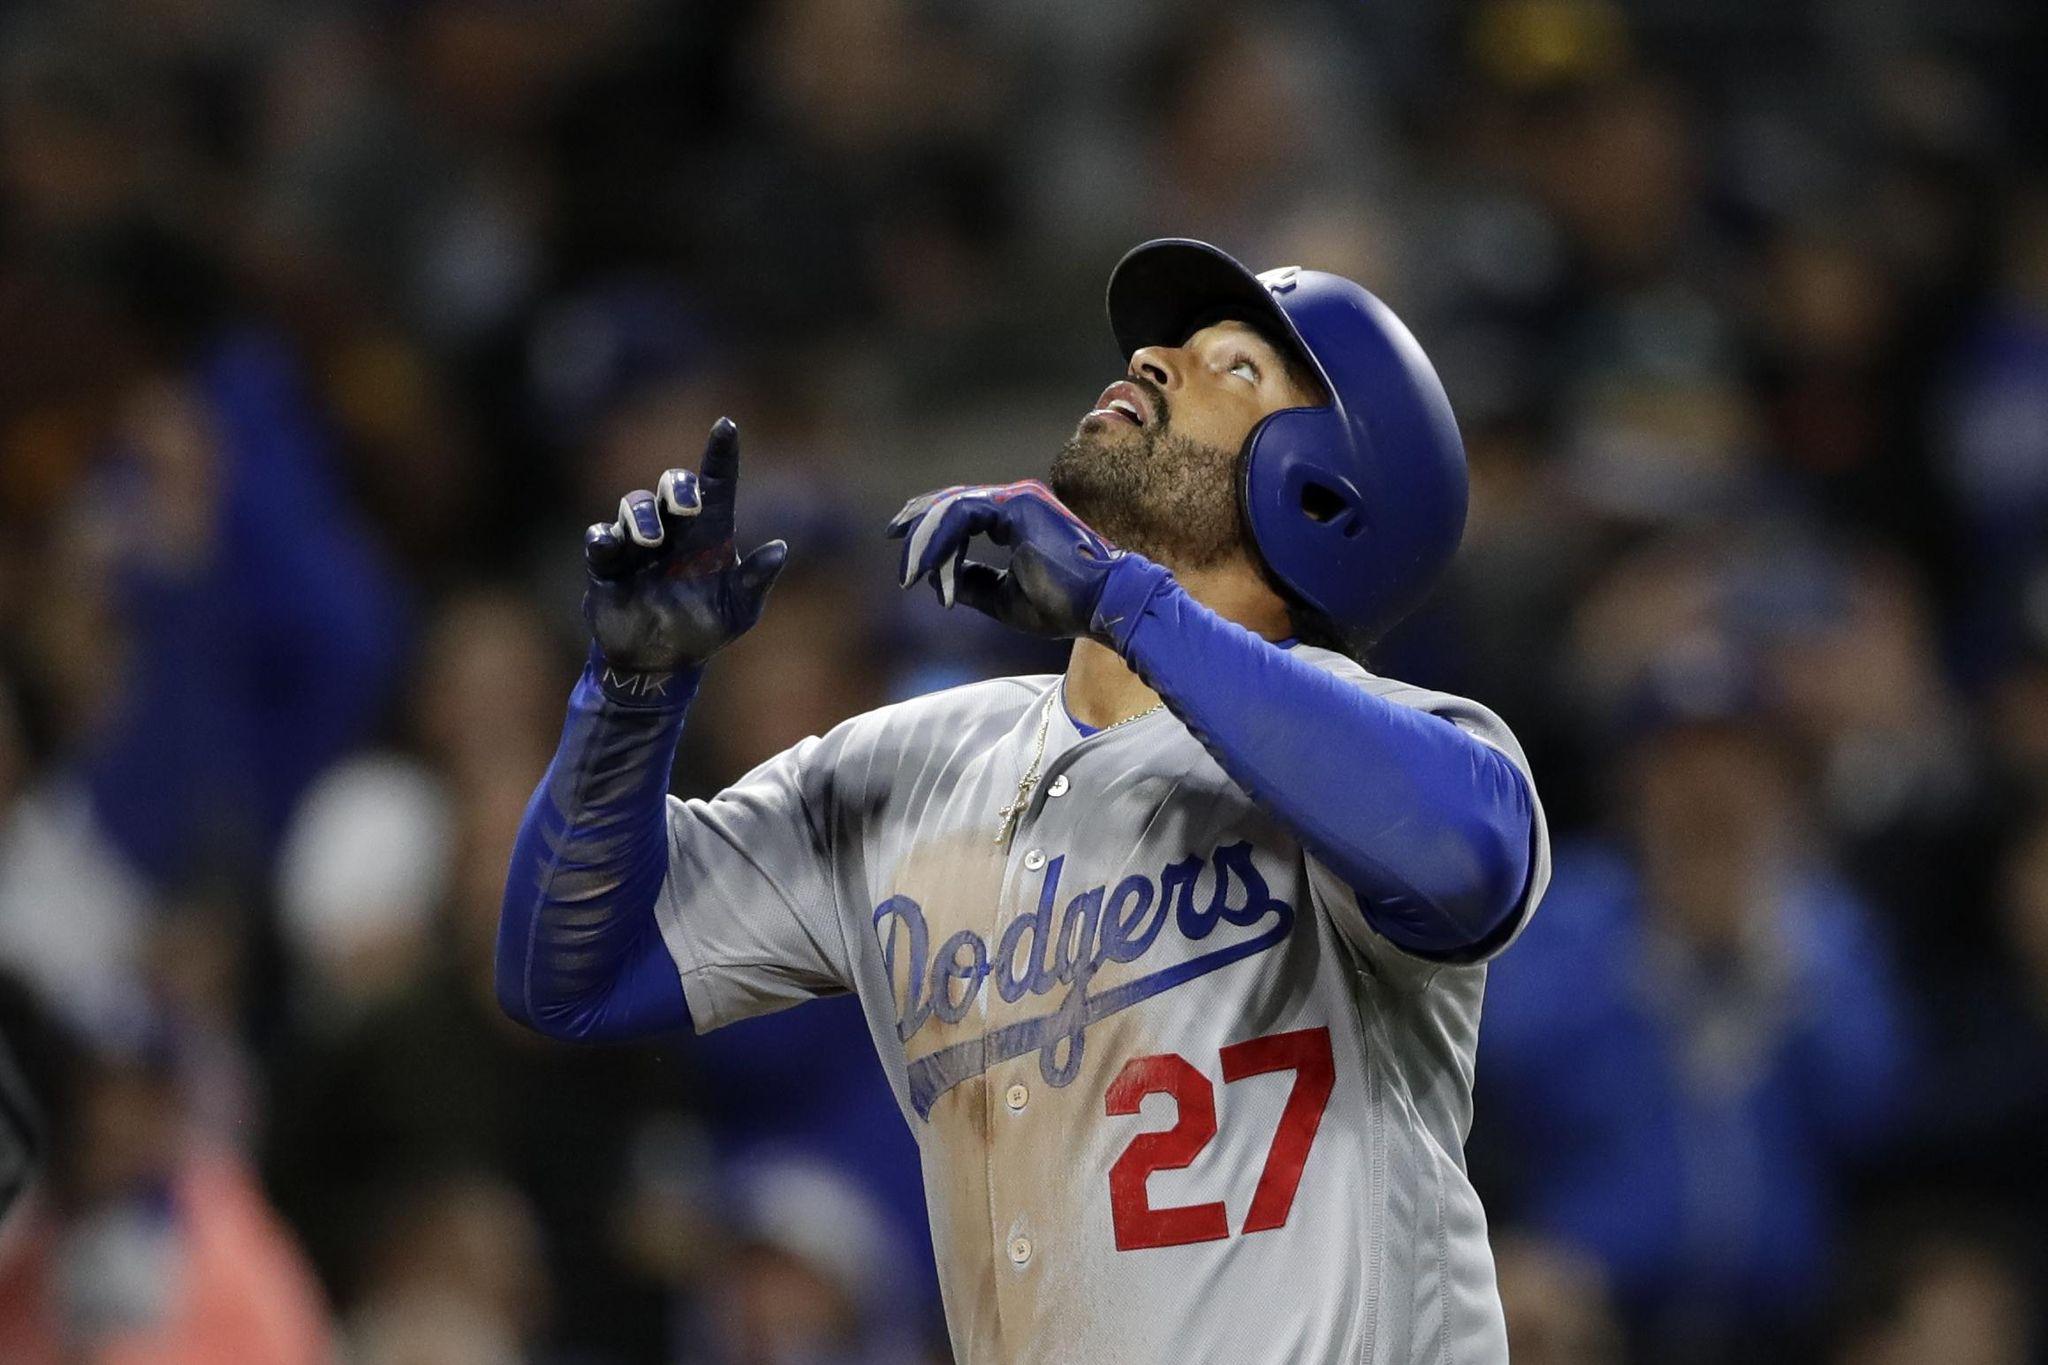 Dodgers_padres_baseball_39823_s2048x1365